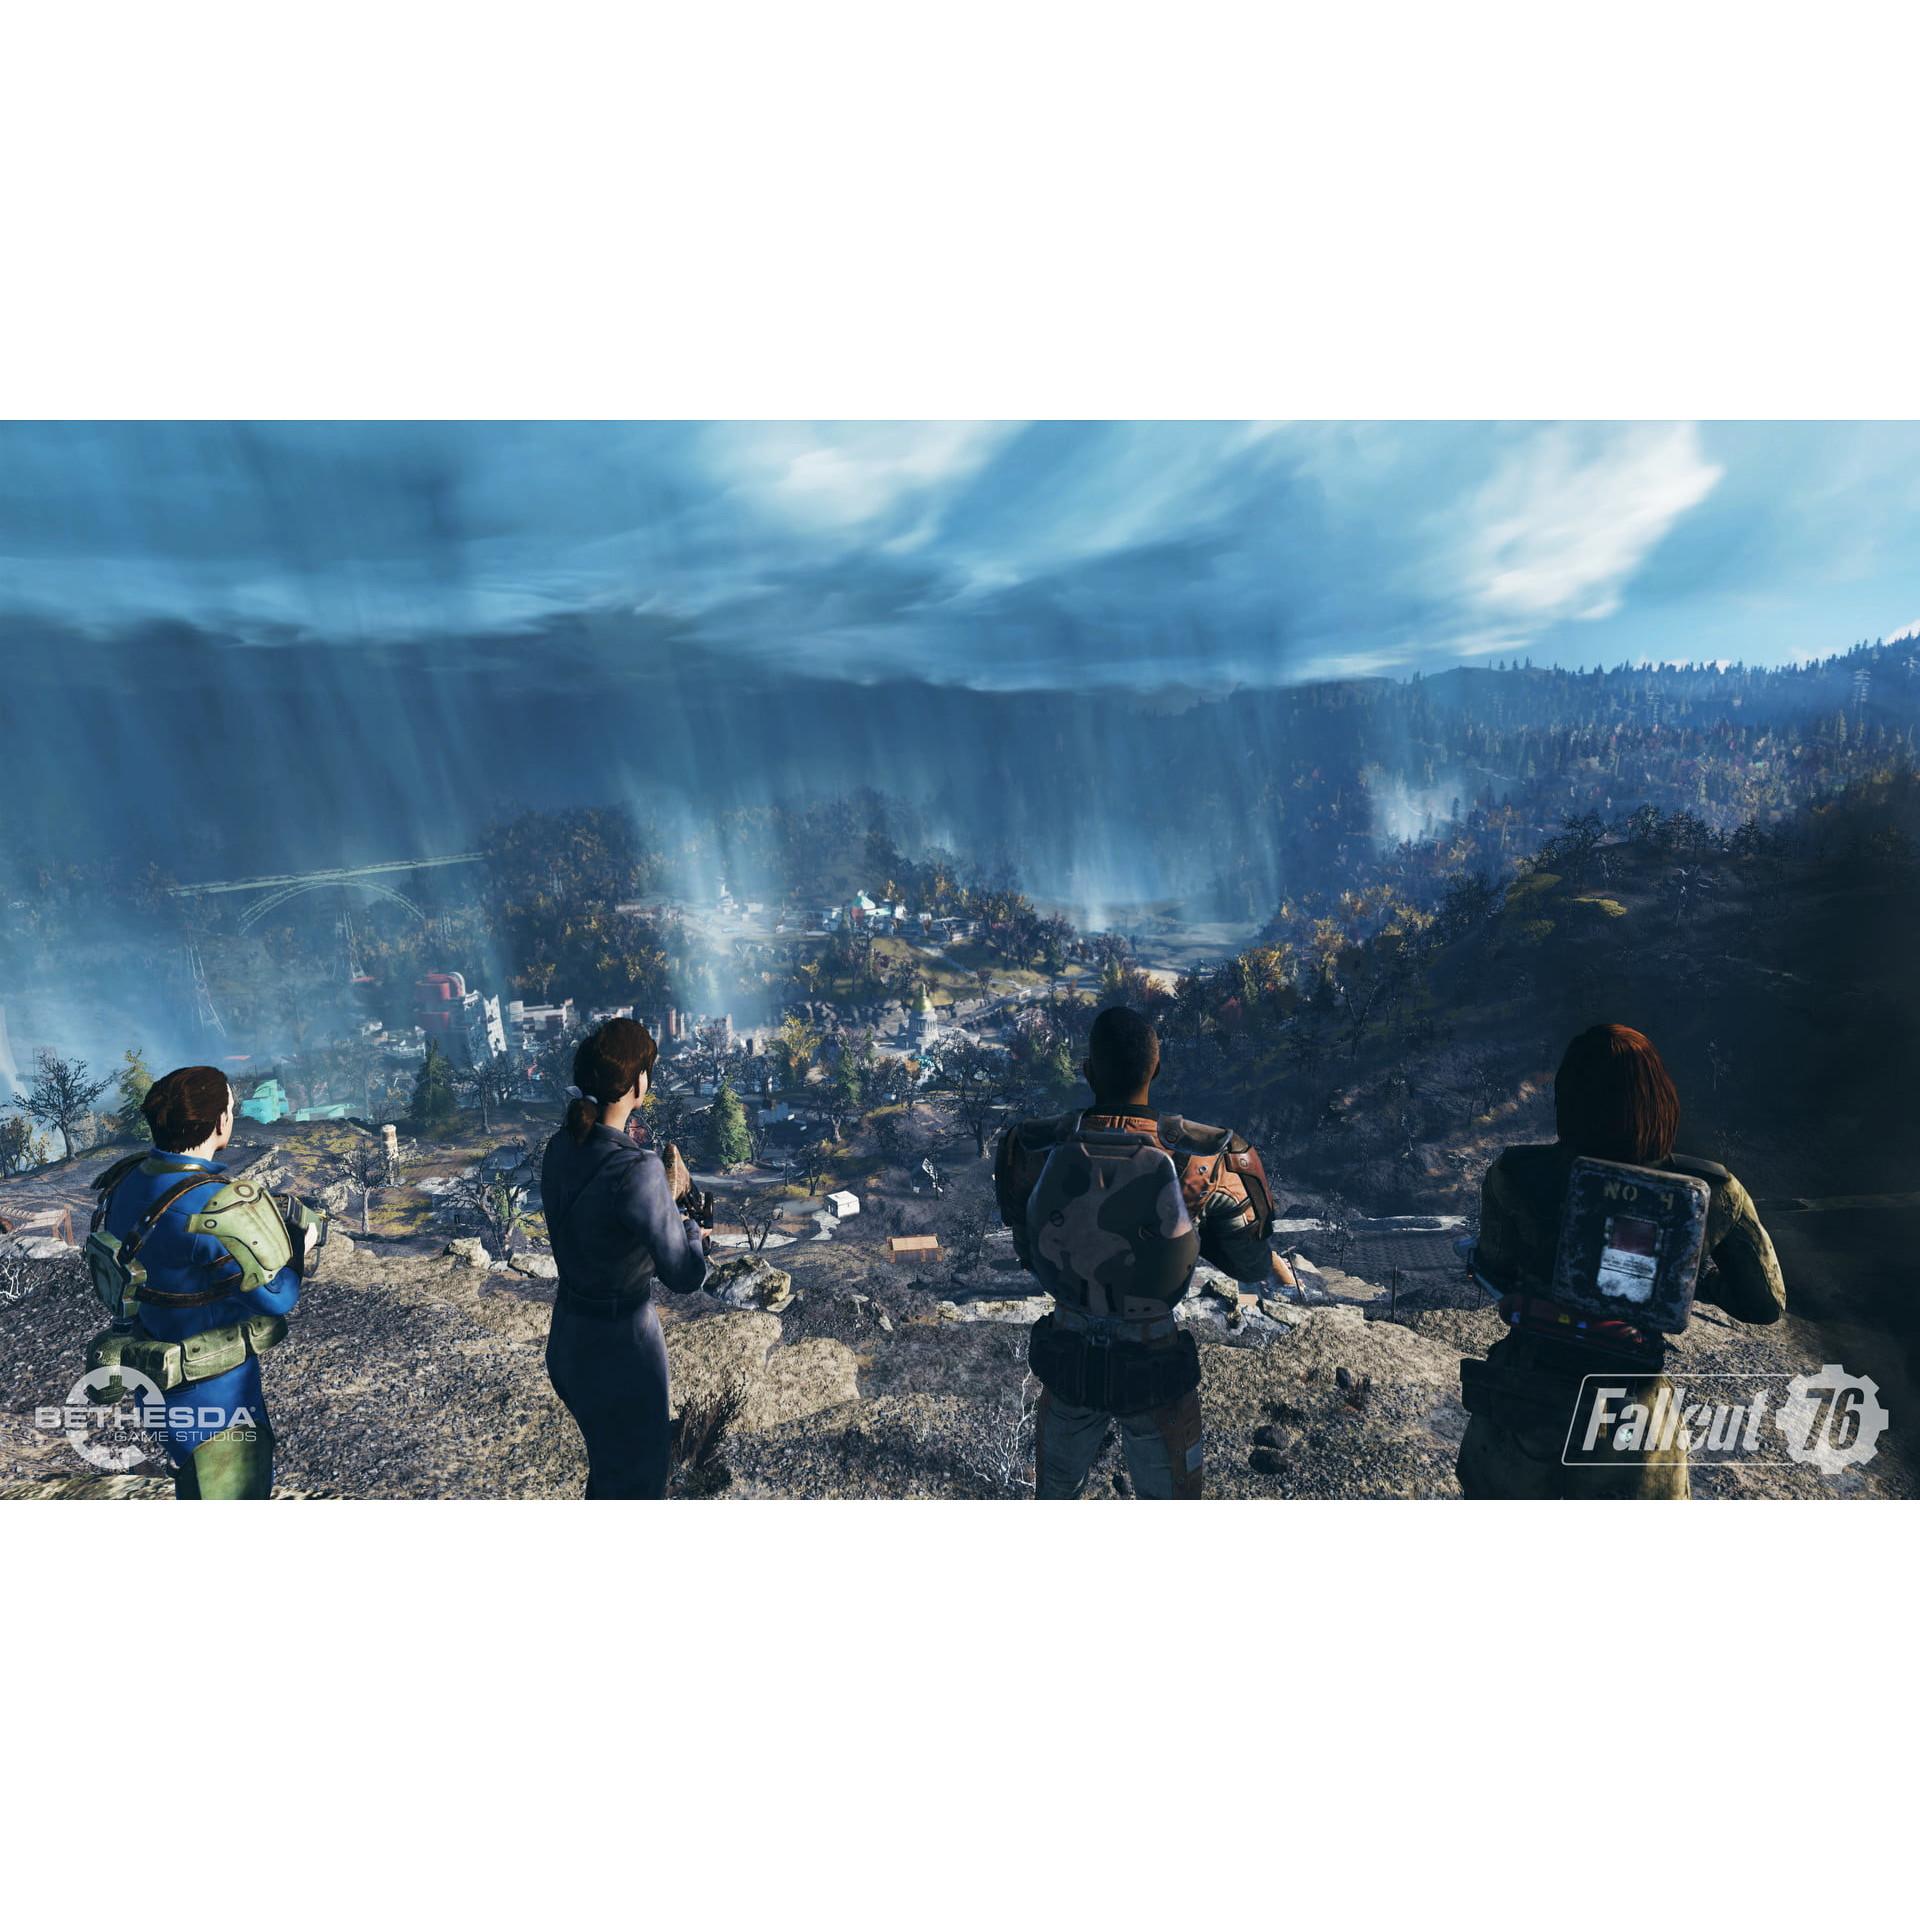 Joc Fallout 76 EU Bethesda CD Key Pentru Calculator 3